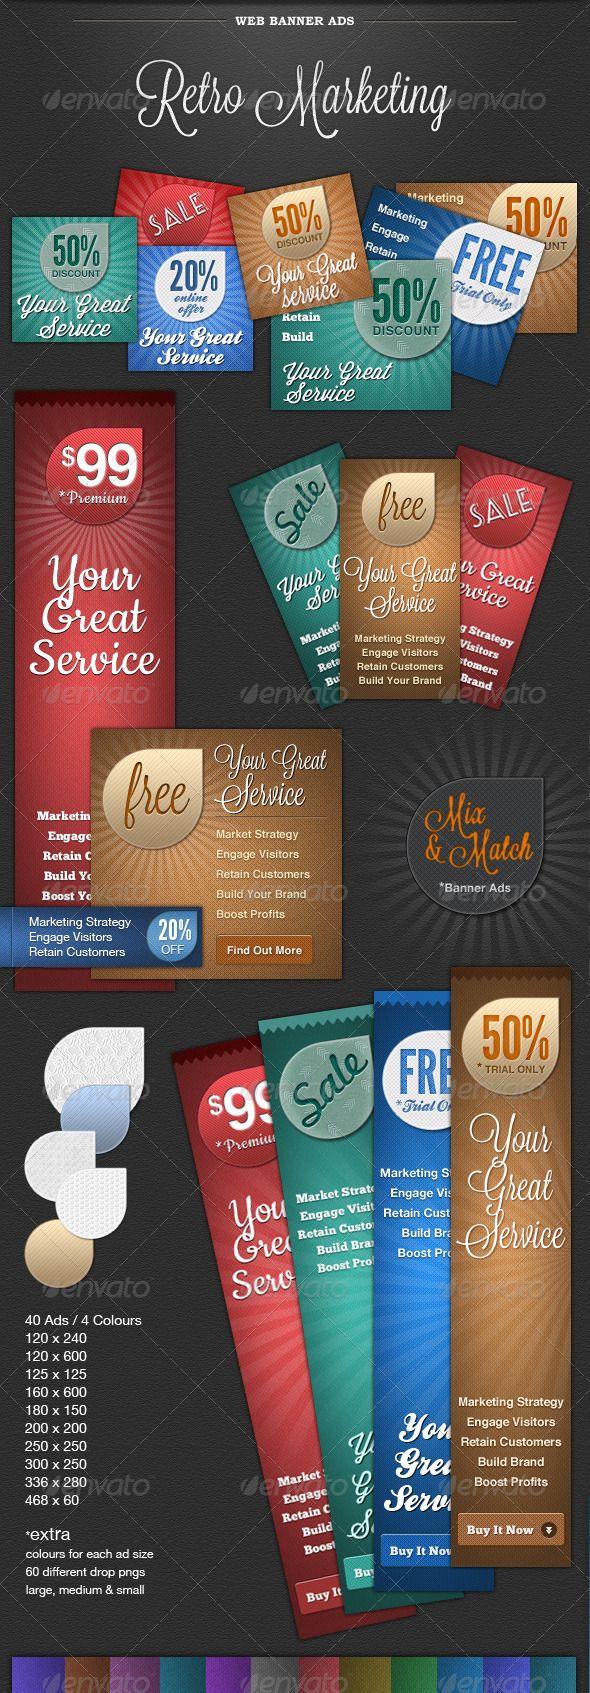 Ретро-маркетинг: стильные веб-баннеры #баннер #ретро #дизайн #сайты